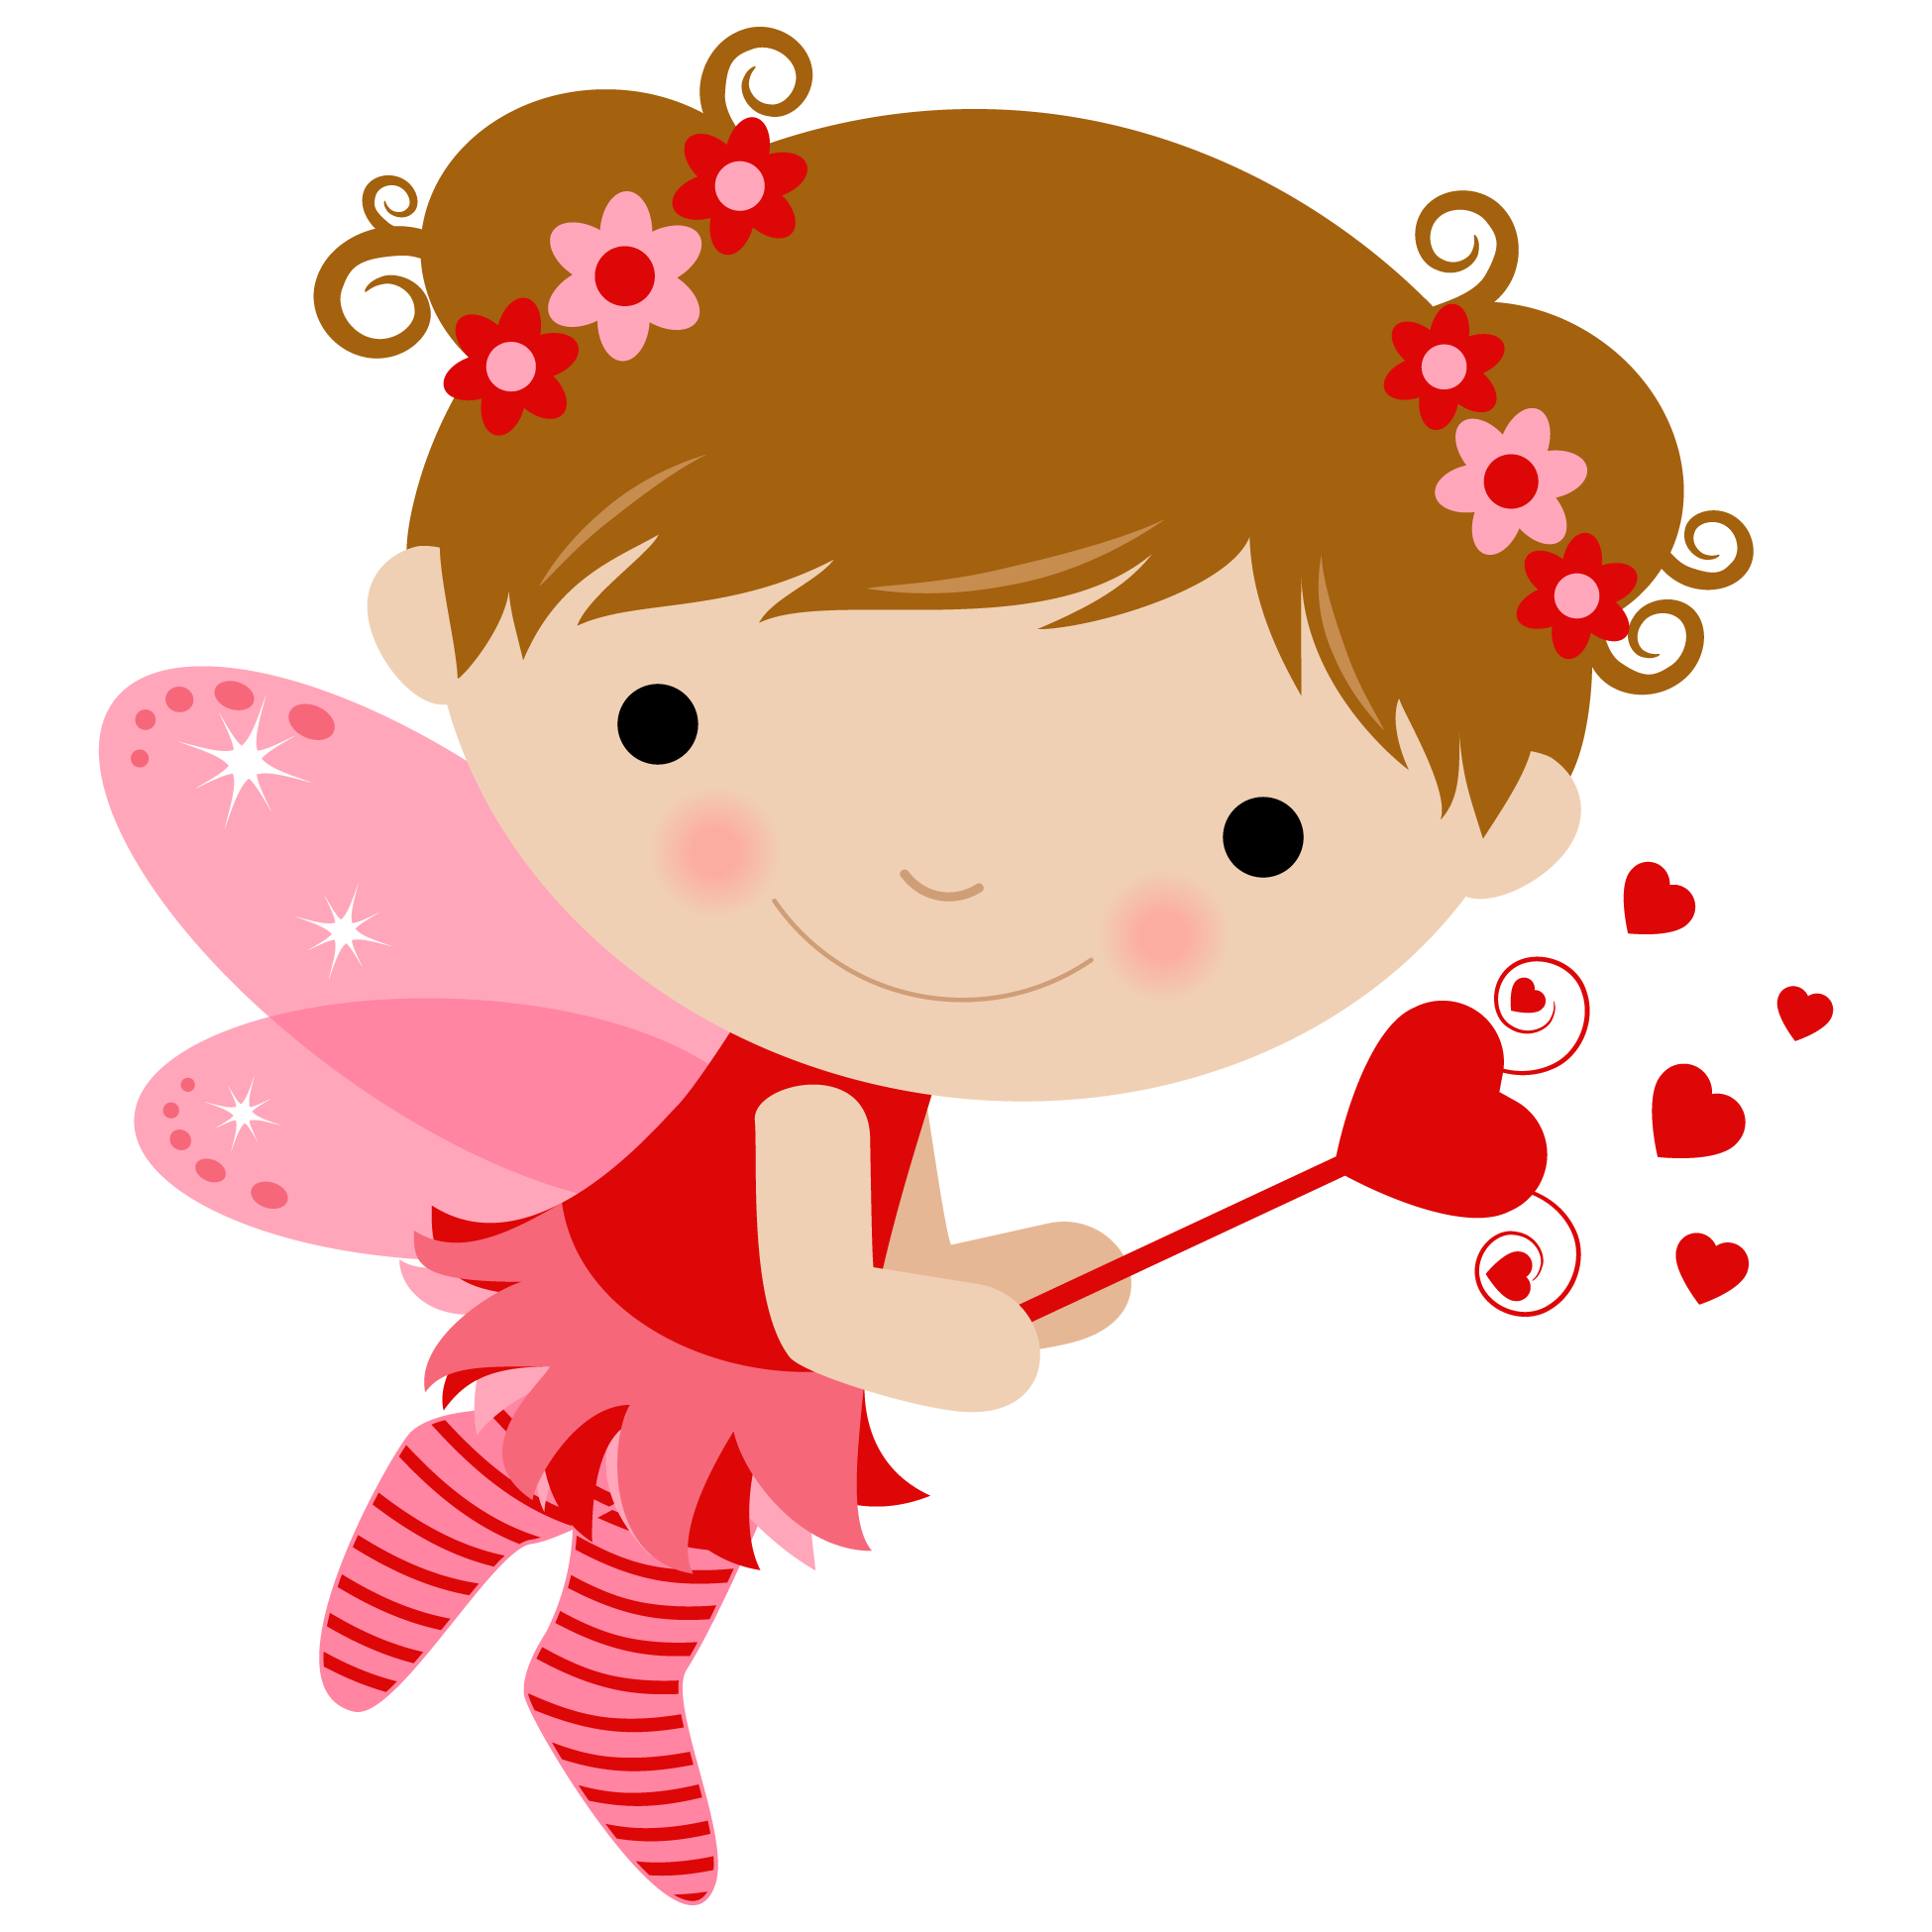 alas hadas pinterest. Cupid clipart baby girl